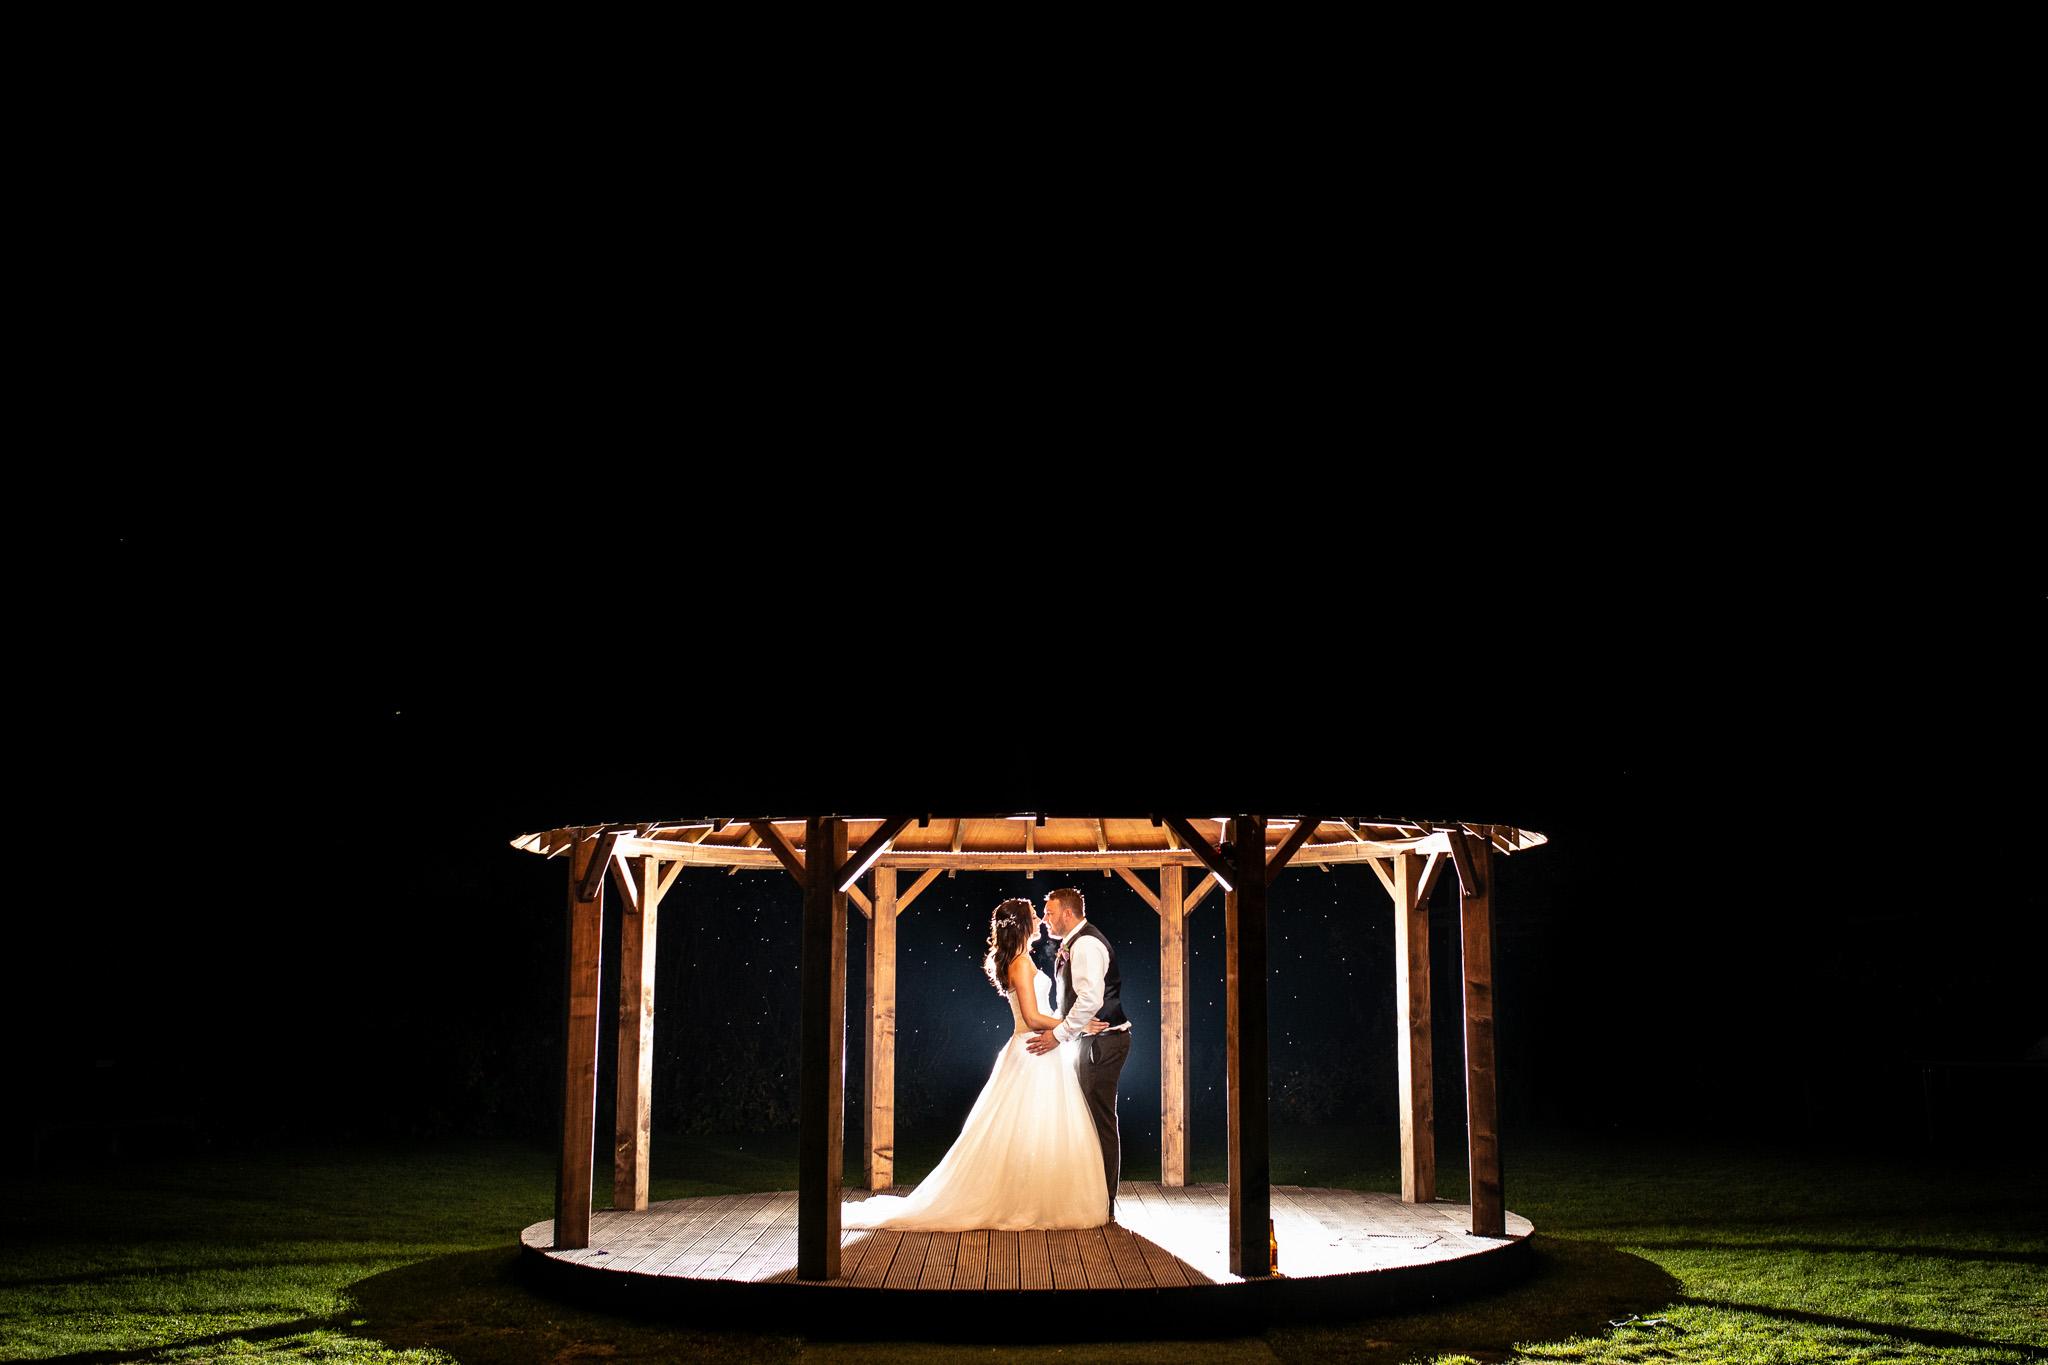 Kent wedding photography after dark at gardens of yalding